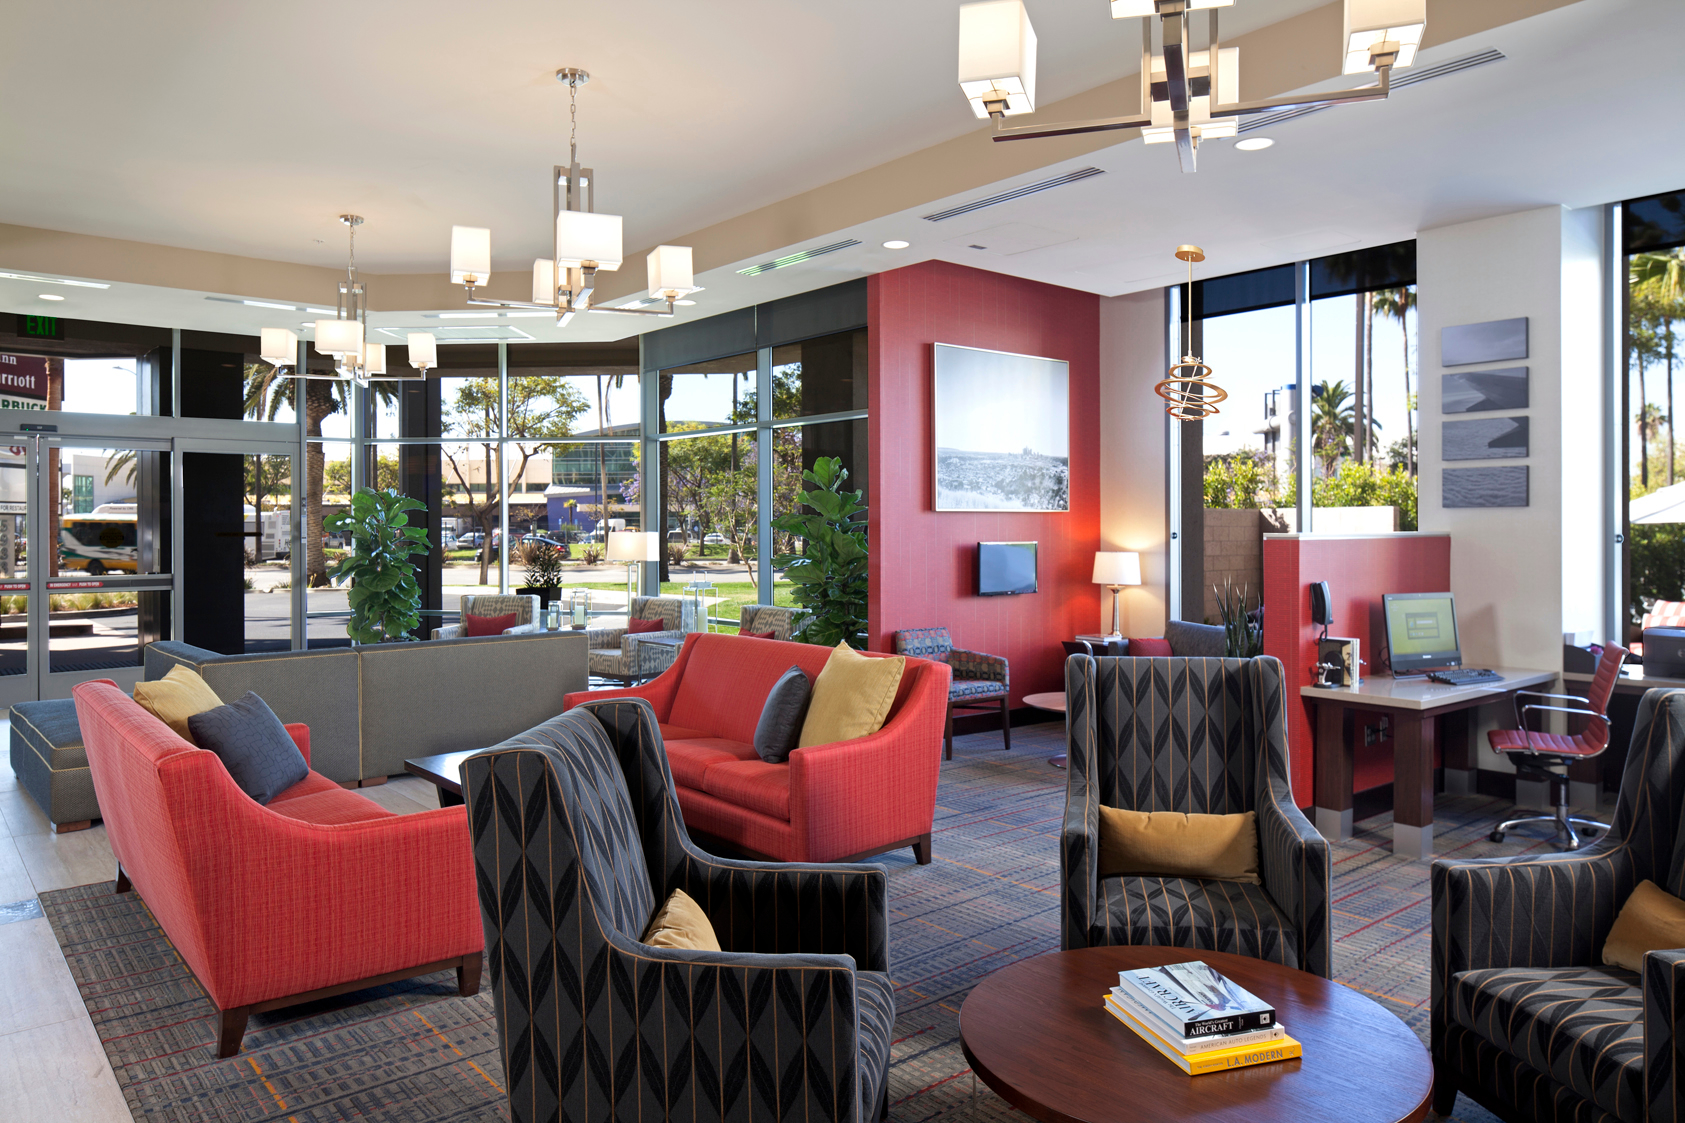 Residence Inn by Marriott Los Angeles LAX/Century Boulevard image 20